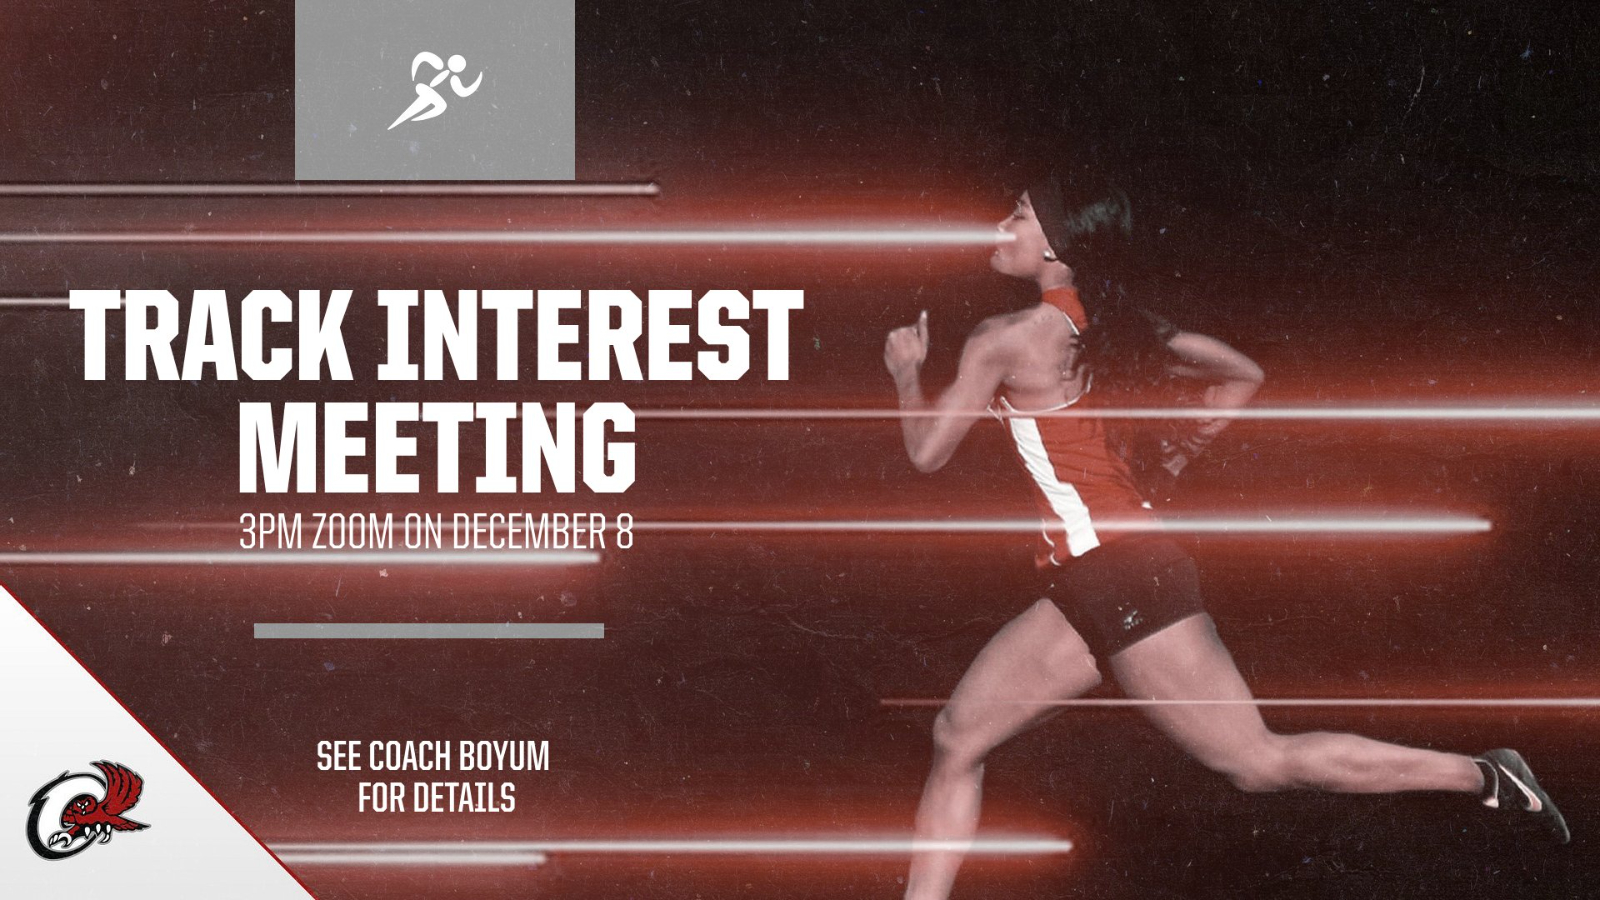 Track Interest Meeting via Zoom